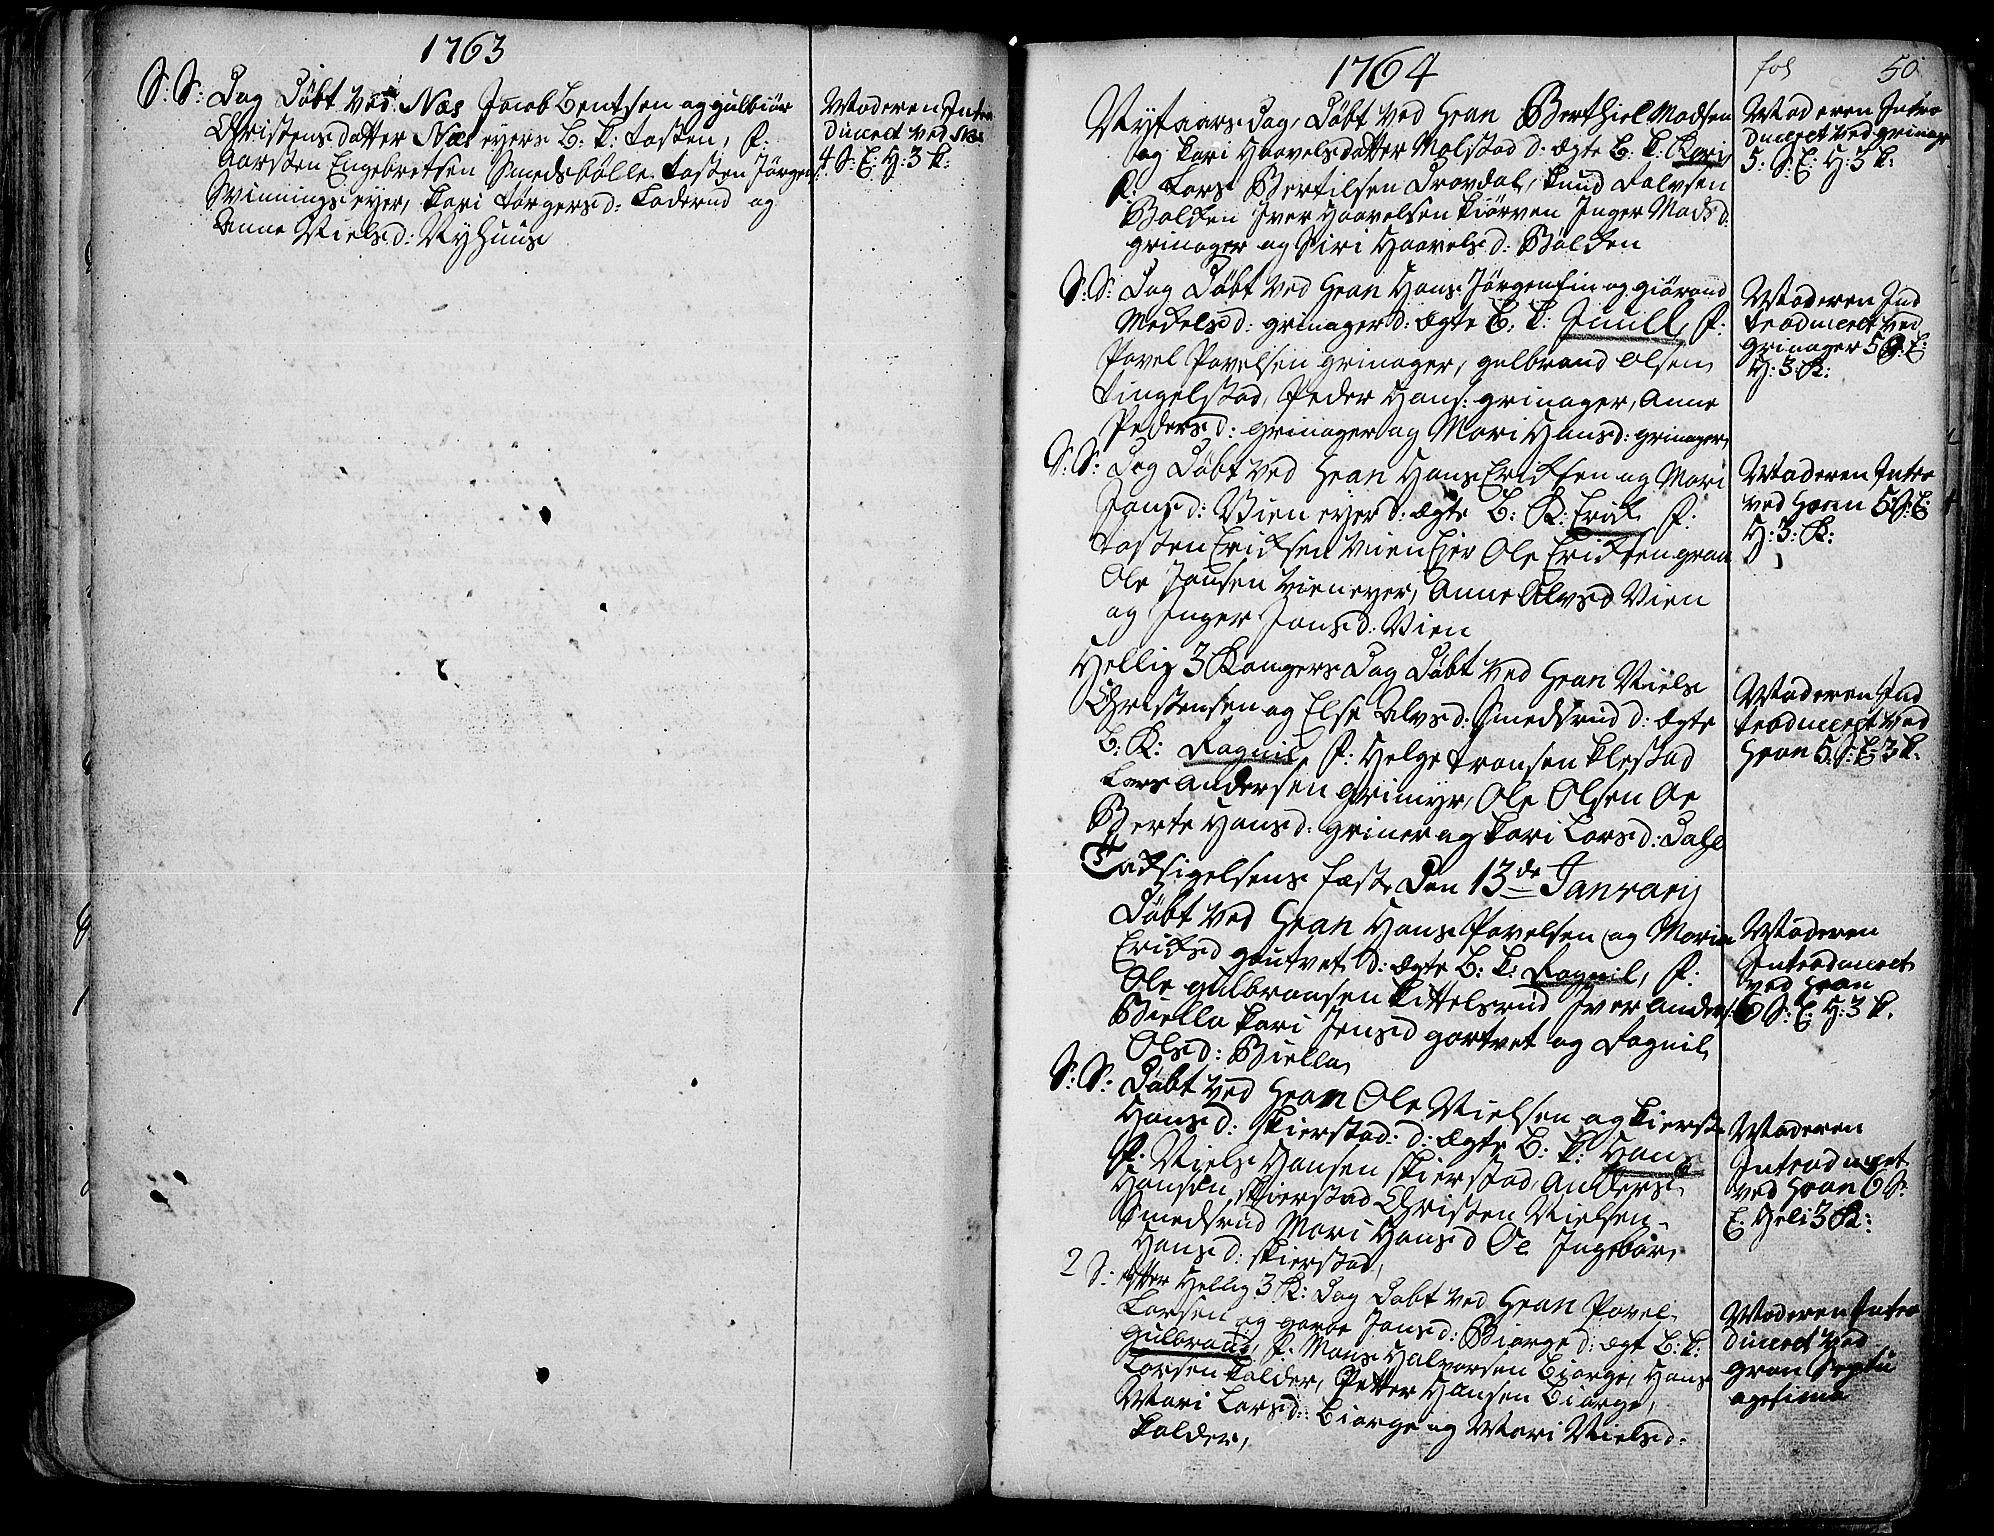 SAH, Gran prestekontor, Ministerialbok nr. 4, 1759-1775, s. 50